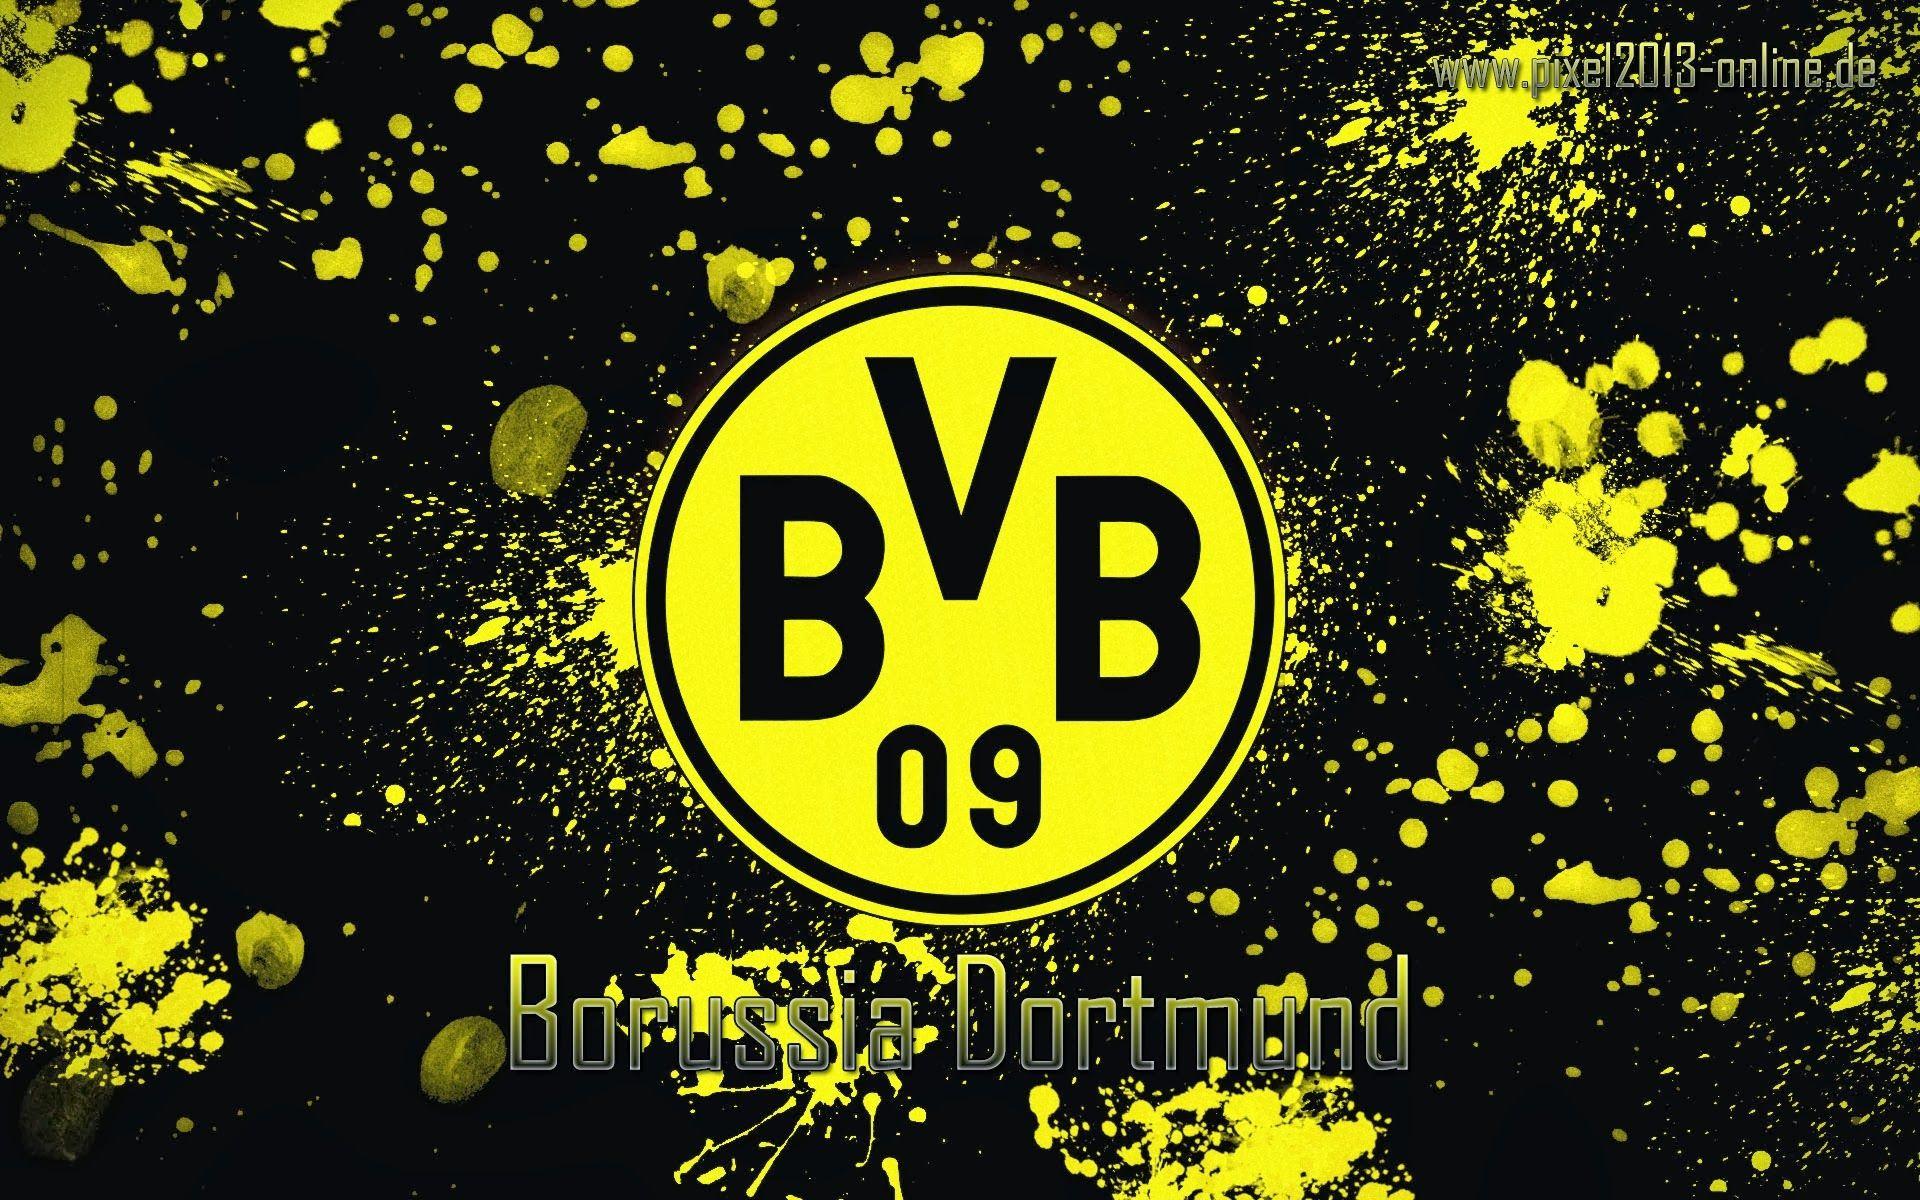 Borussia Dortmund D Logo Wallpaper By Fbwallpapershd On Deviantart 958 638 Borussia Dortmund Wallpaper 33 Wal Borussia Dortmund Wallpaper Background Wallpaper